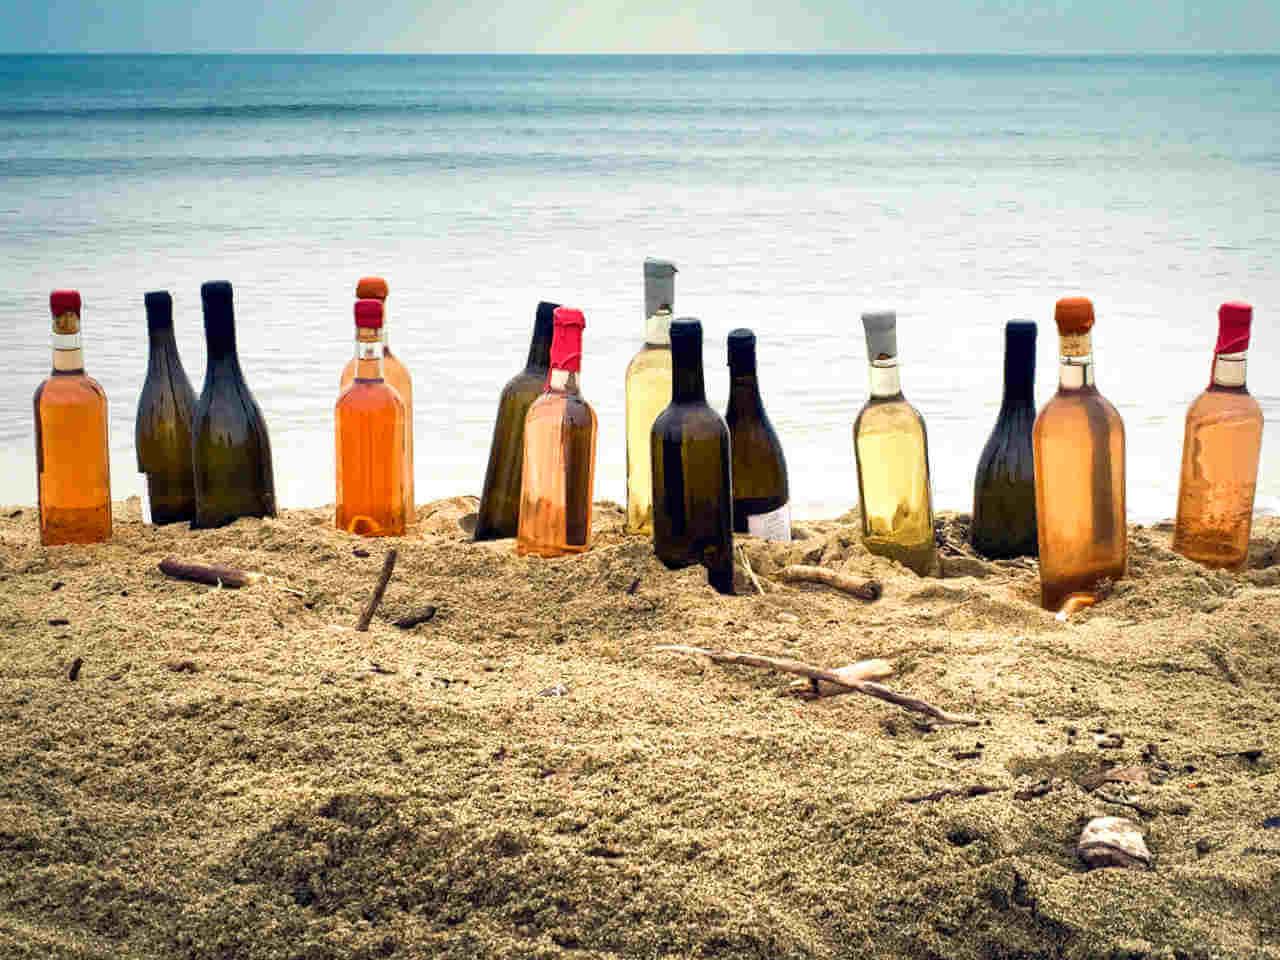 bouteilles_mer_Canet_sable